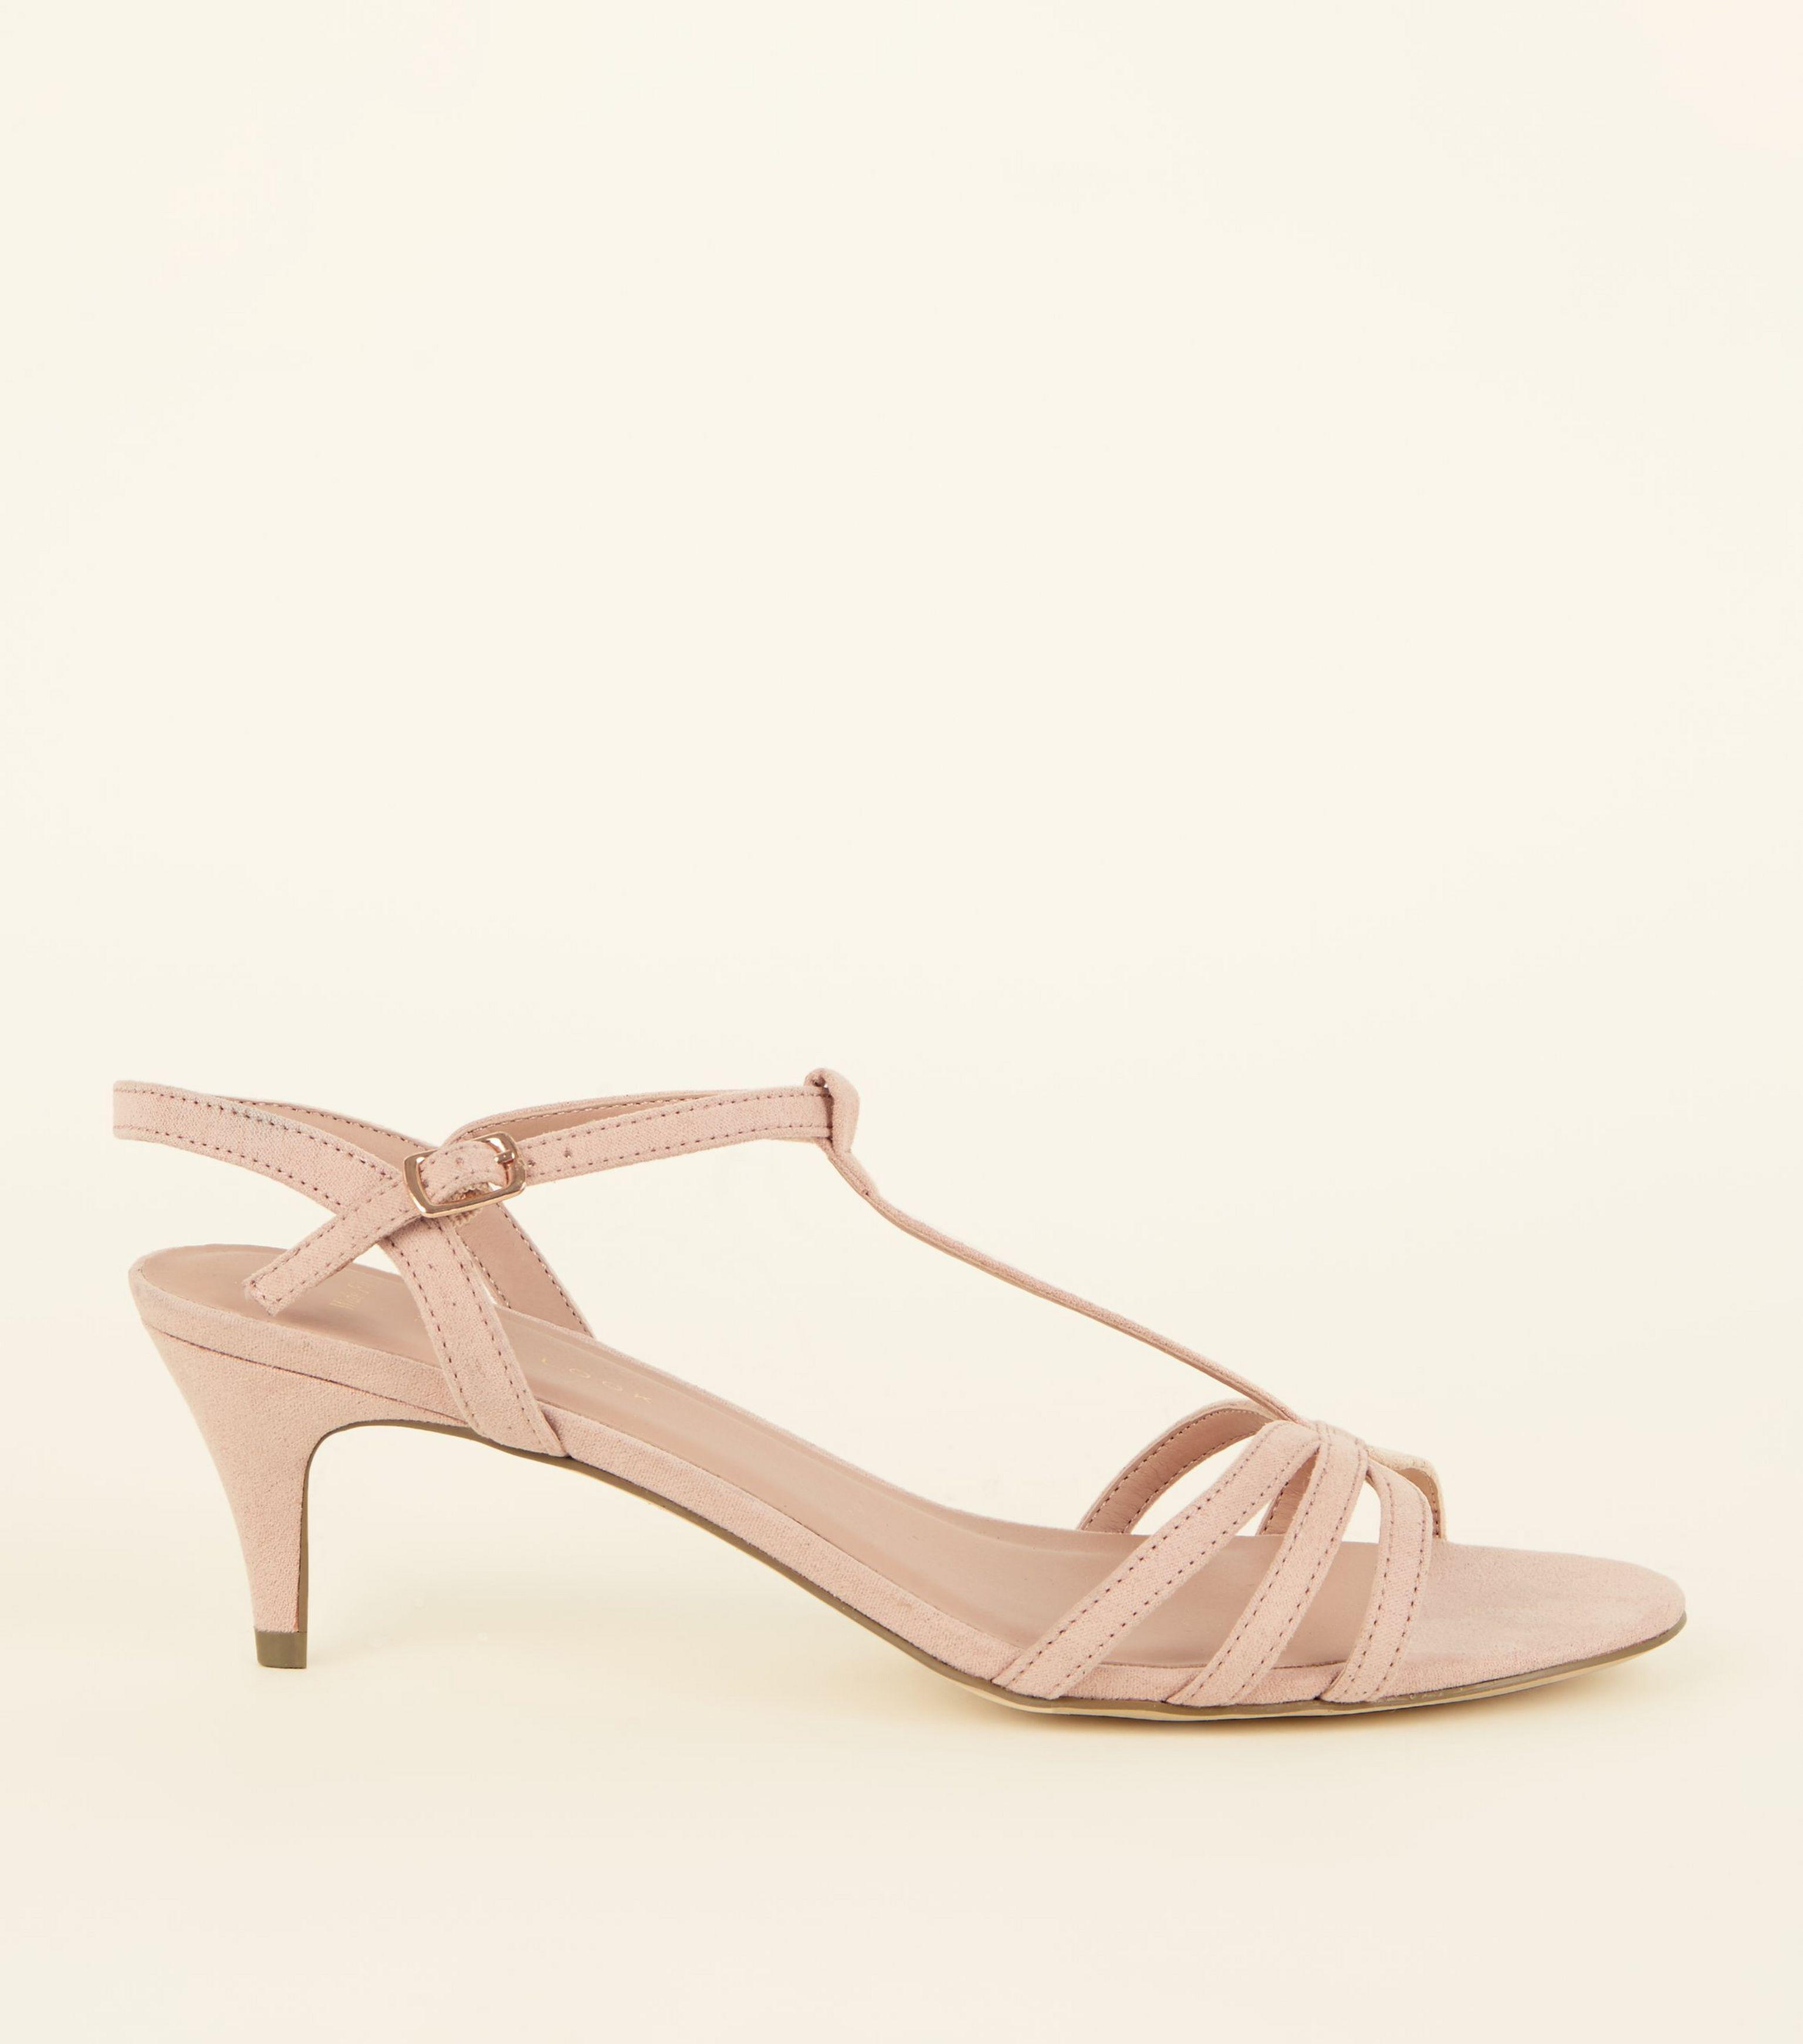 7a49e1e6002 New Look Wide Fit Nude Comfort Flex Suedette Strappy Kitten Heels in ...